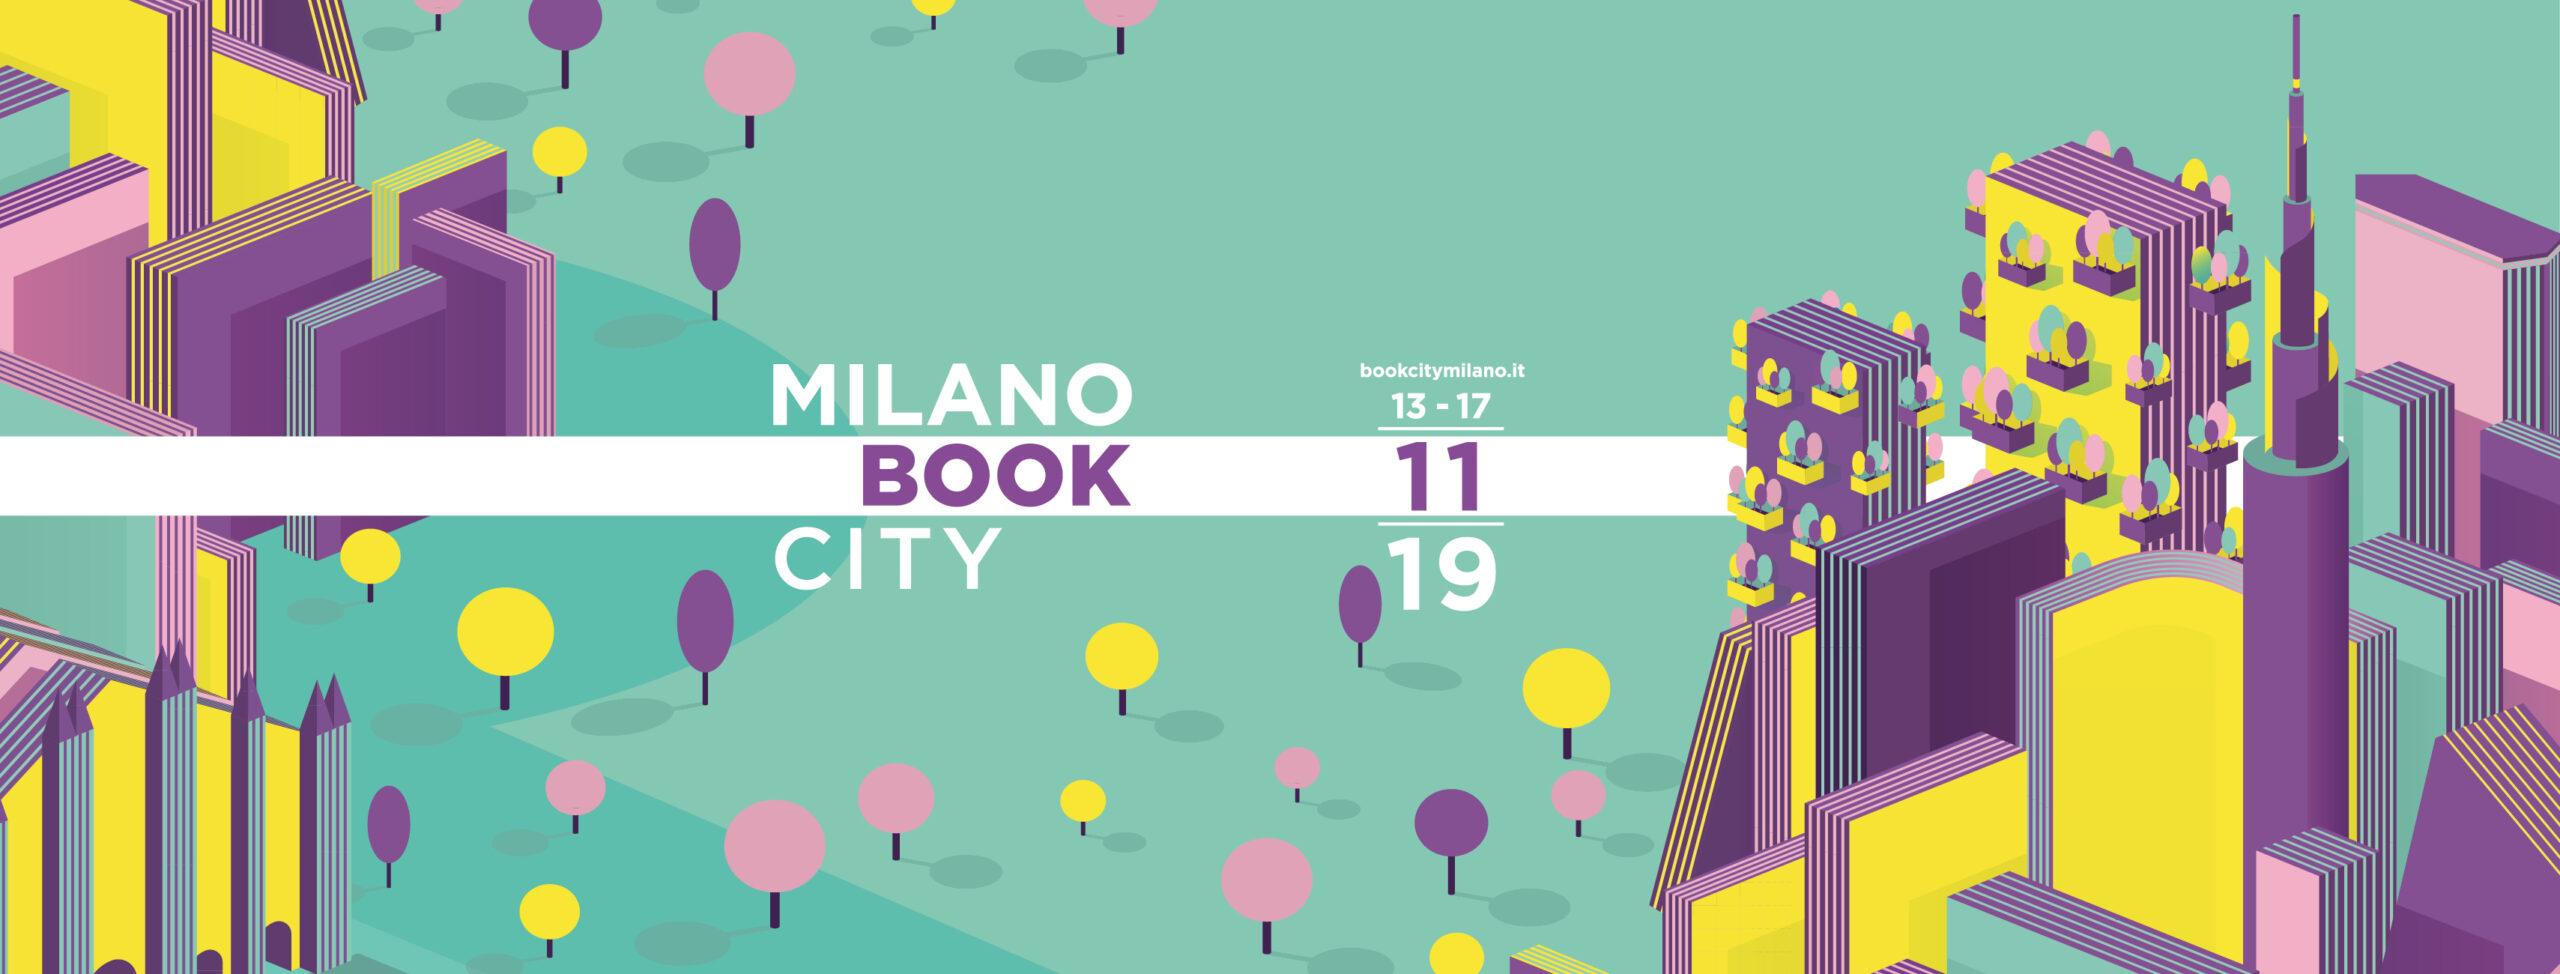 milano-bookcity